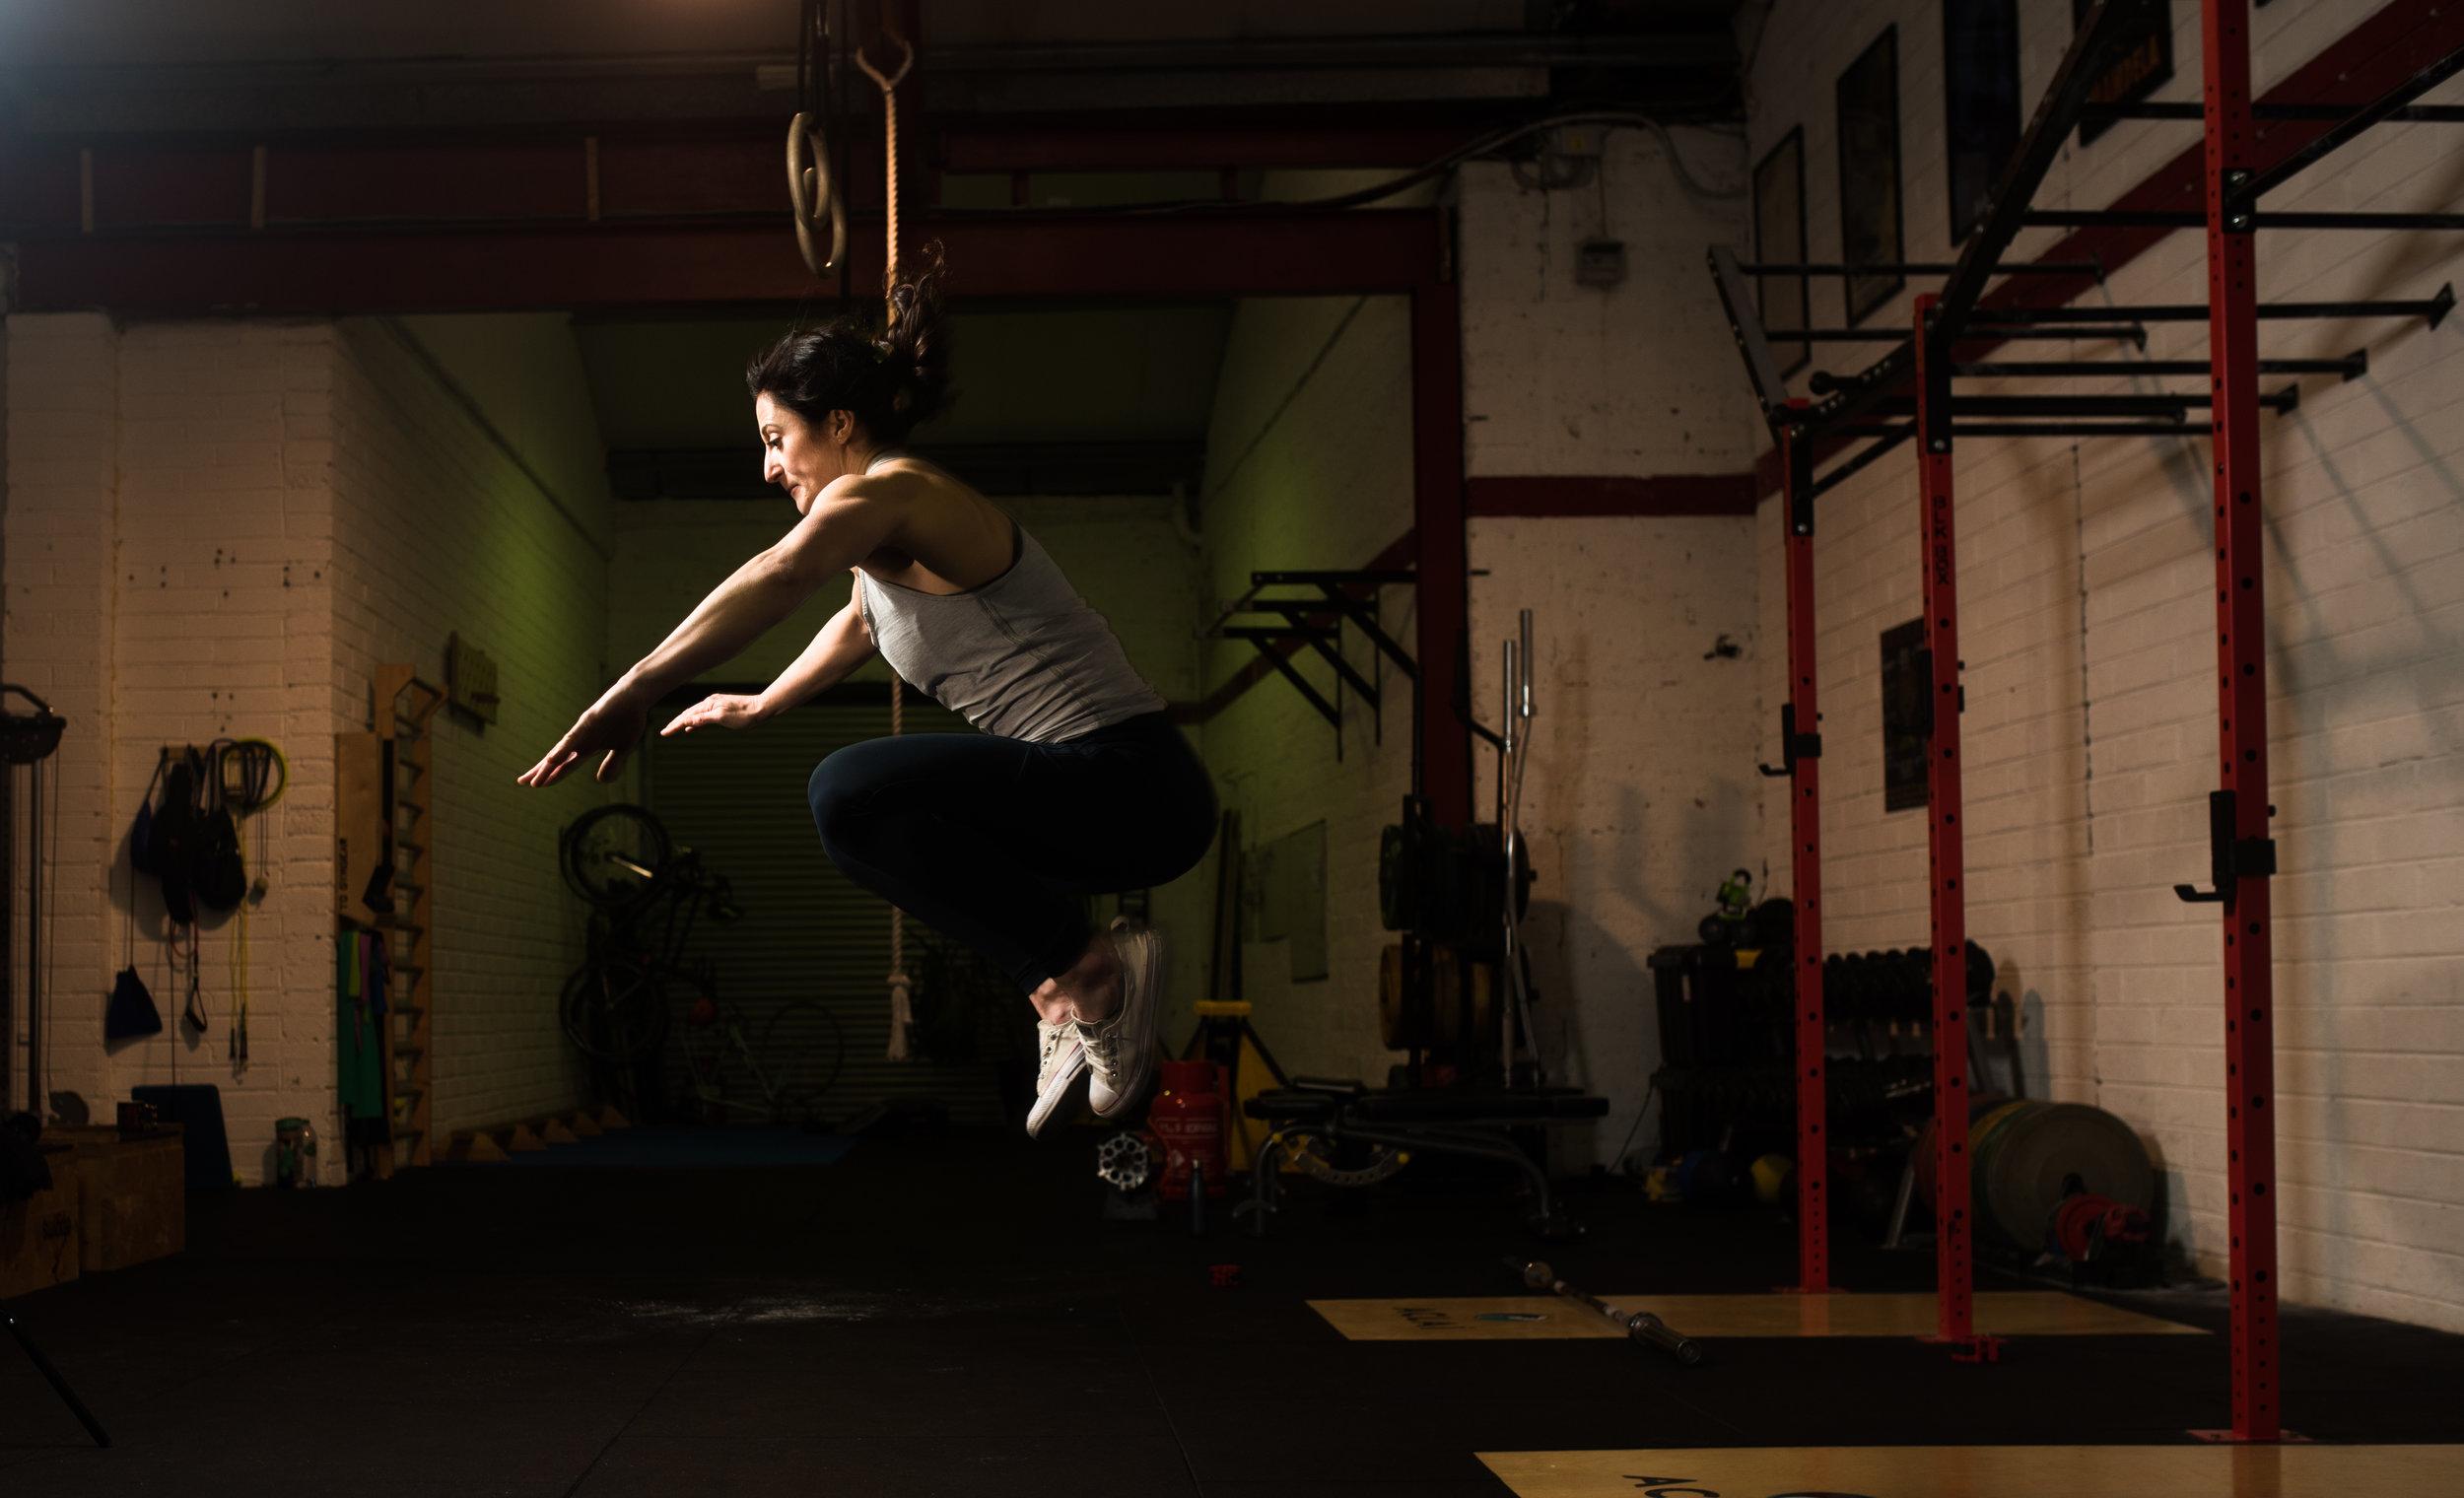 women s fitness personal training aclai cork.jpg